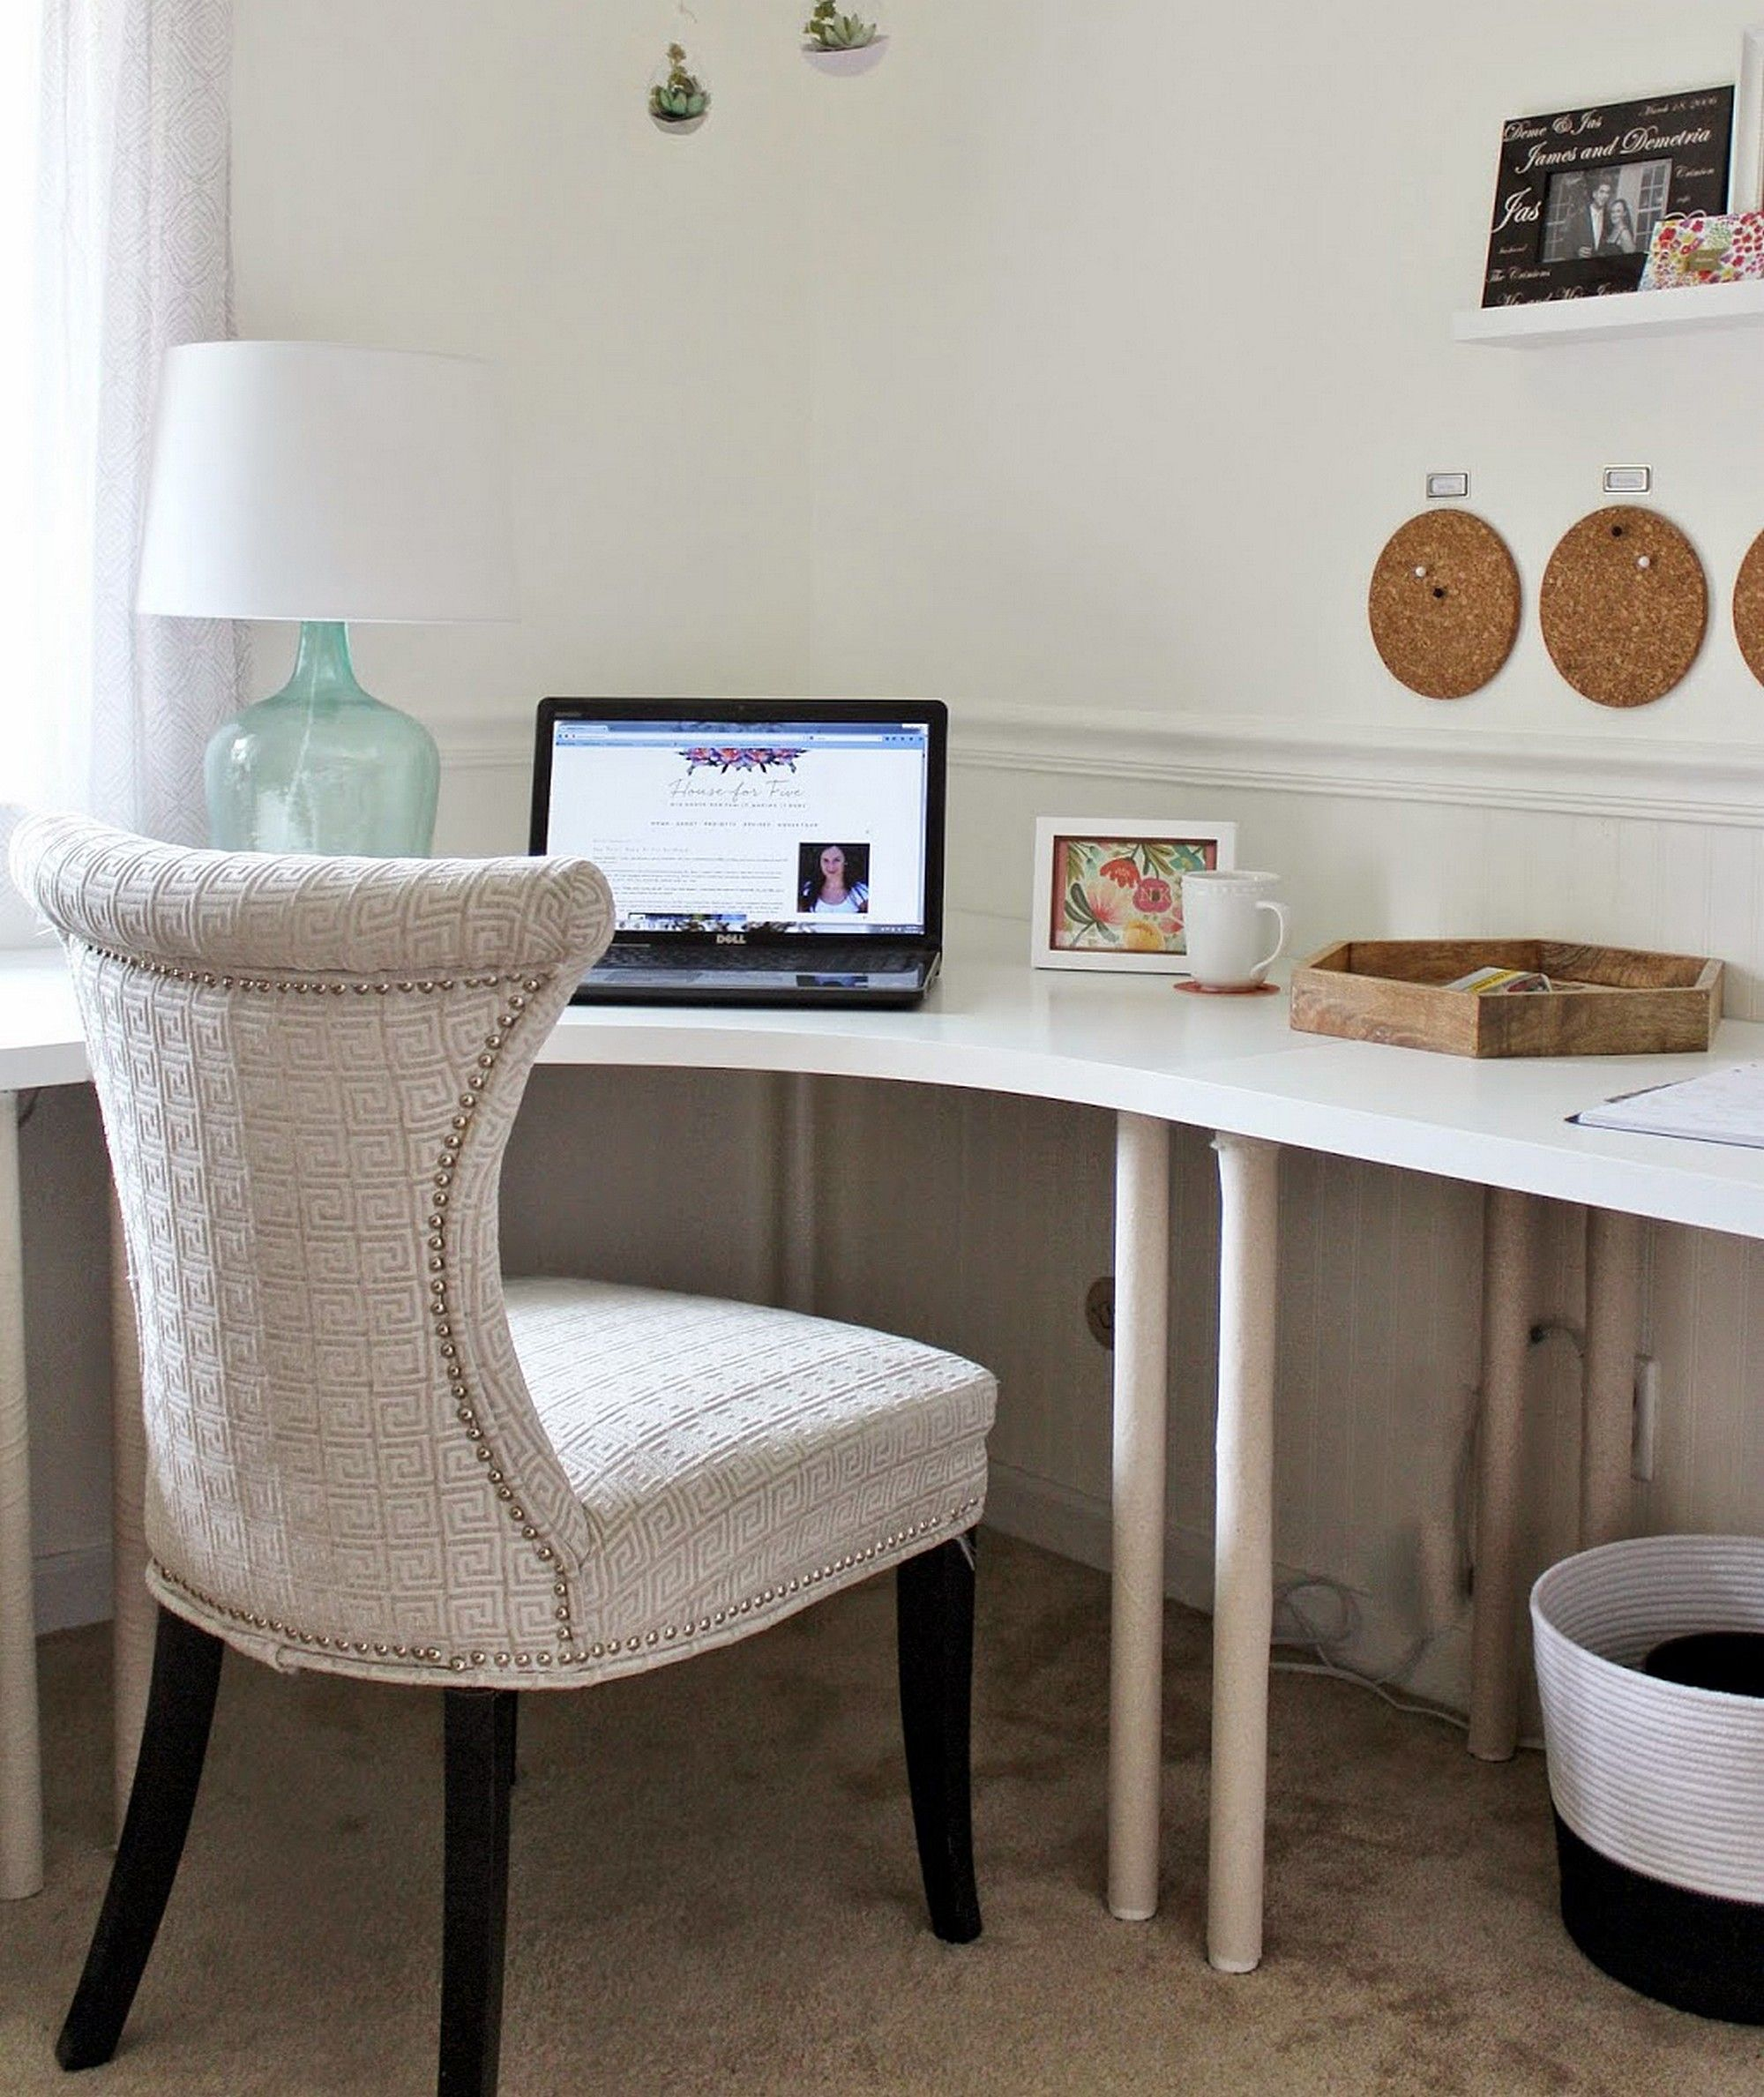 Ikea Linnmon Adils Corner Desk Setup Ideas For Home Office Ikea